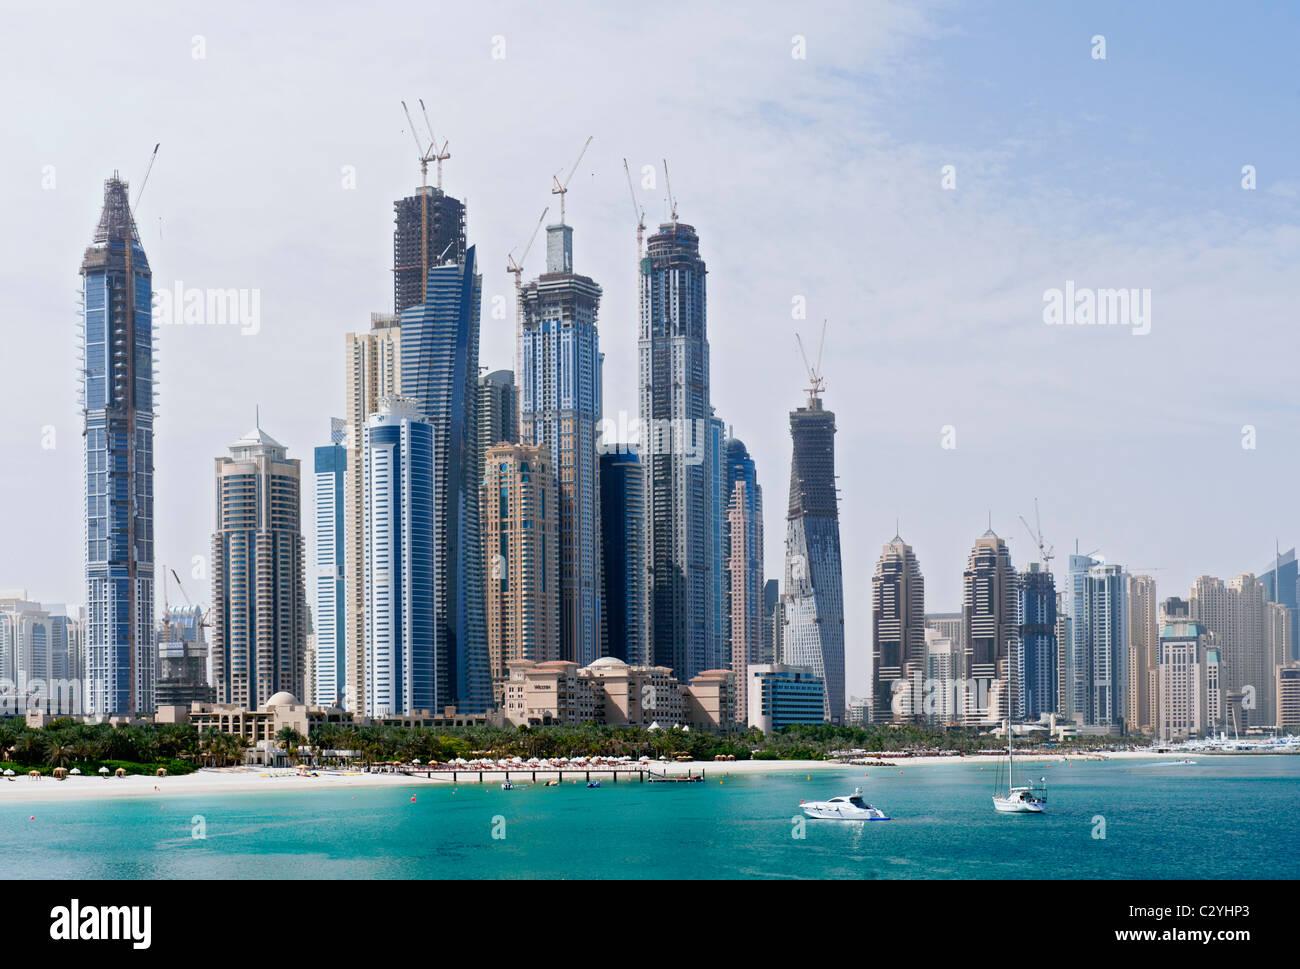 Skyline of modern high rise towers at Dubai Marina district United Arab Emirates UAE - Stock Image